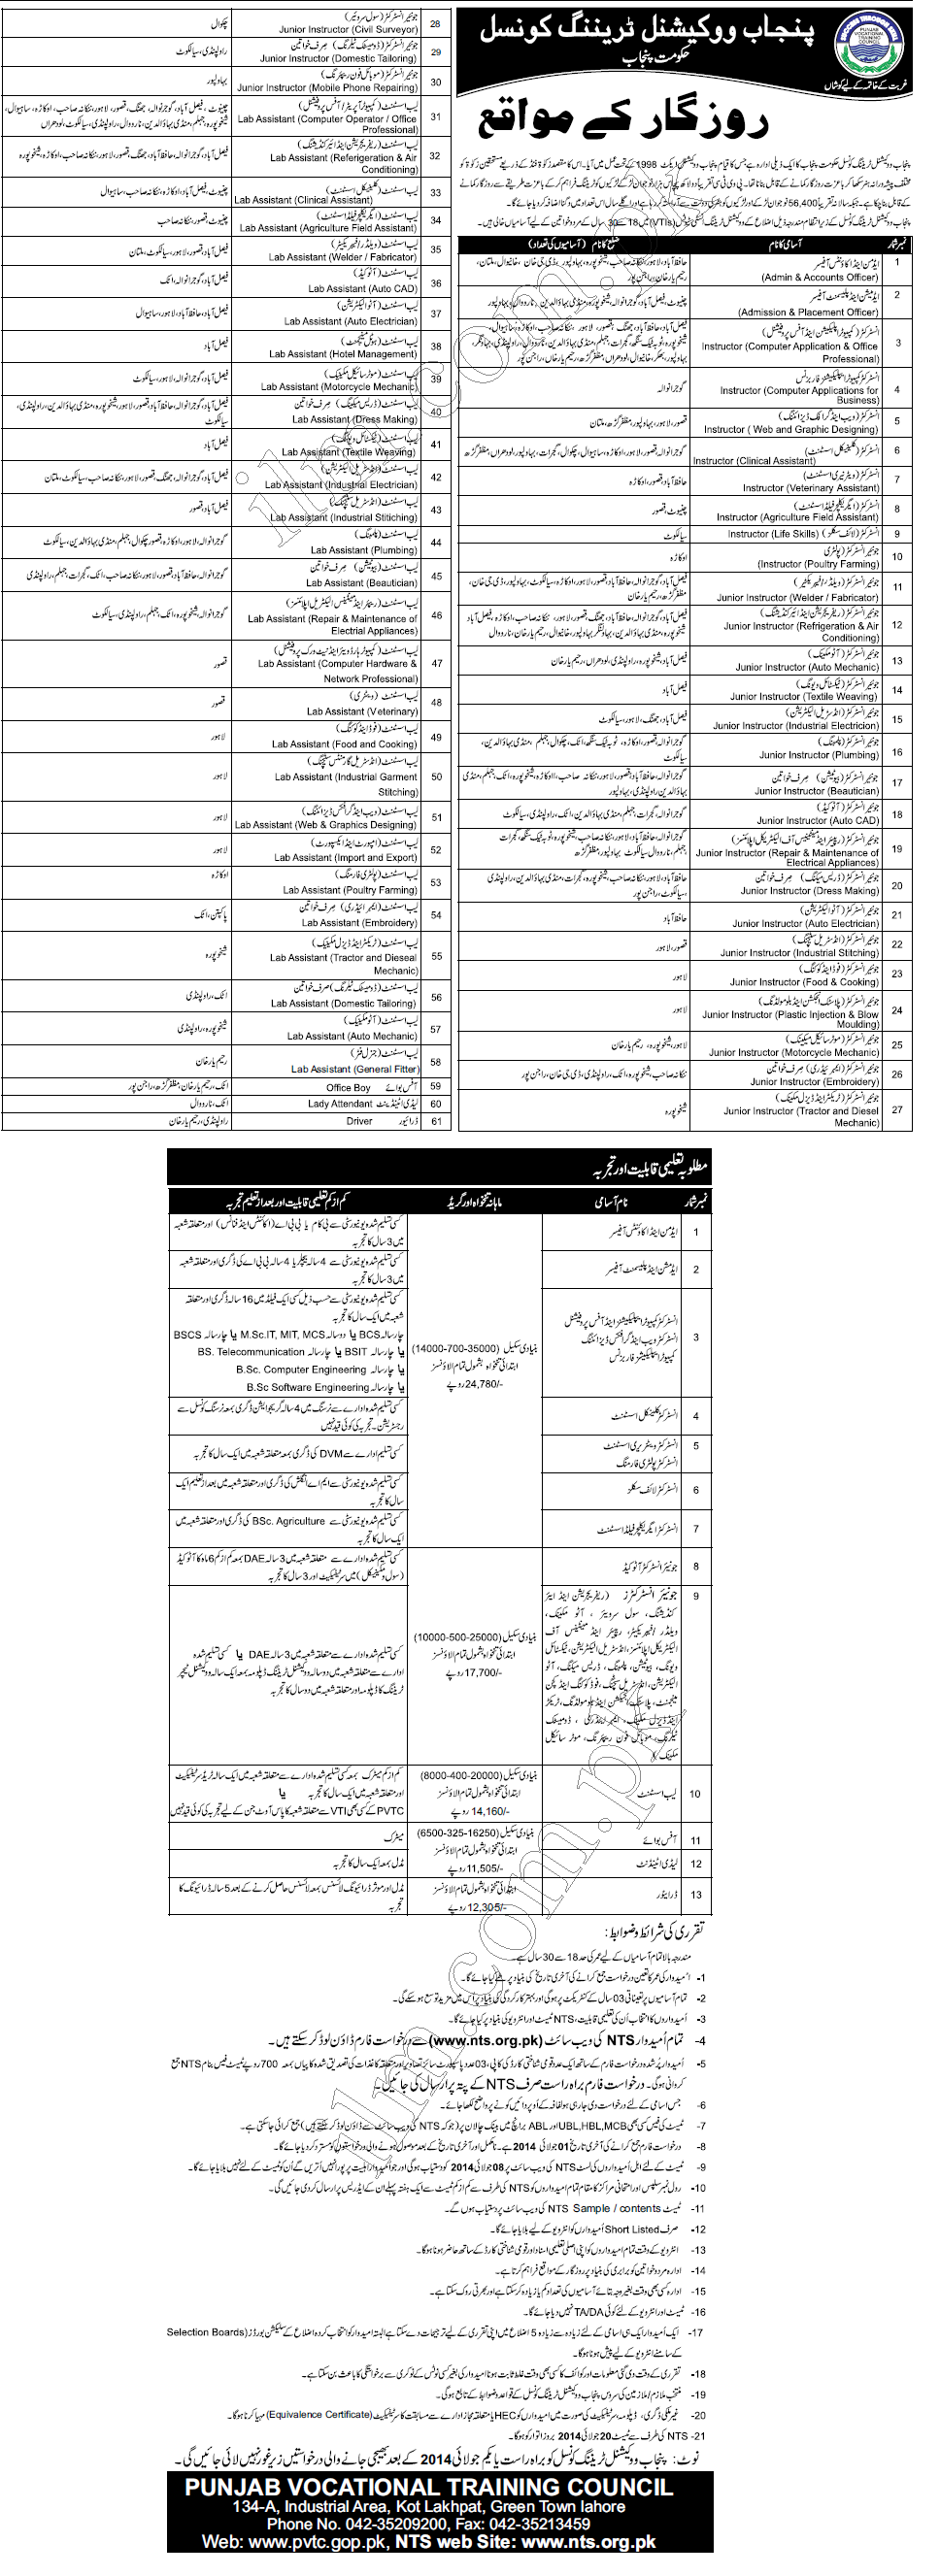 Punjab Vocational Training Council PVTC NTS Jobs June 2014 Form Download